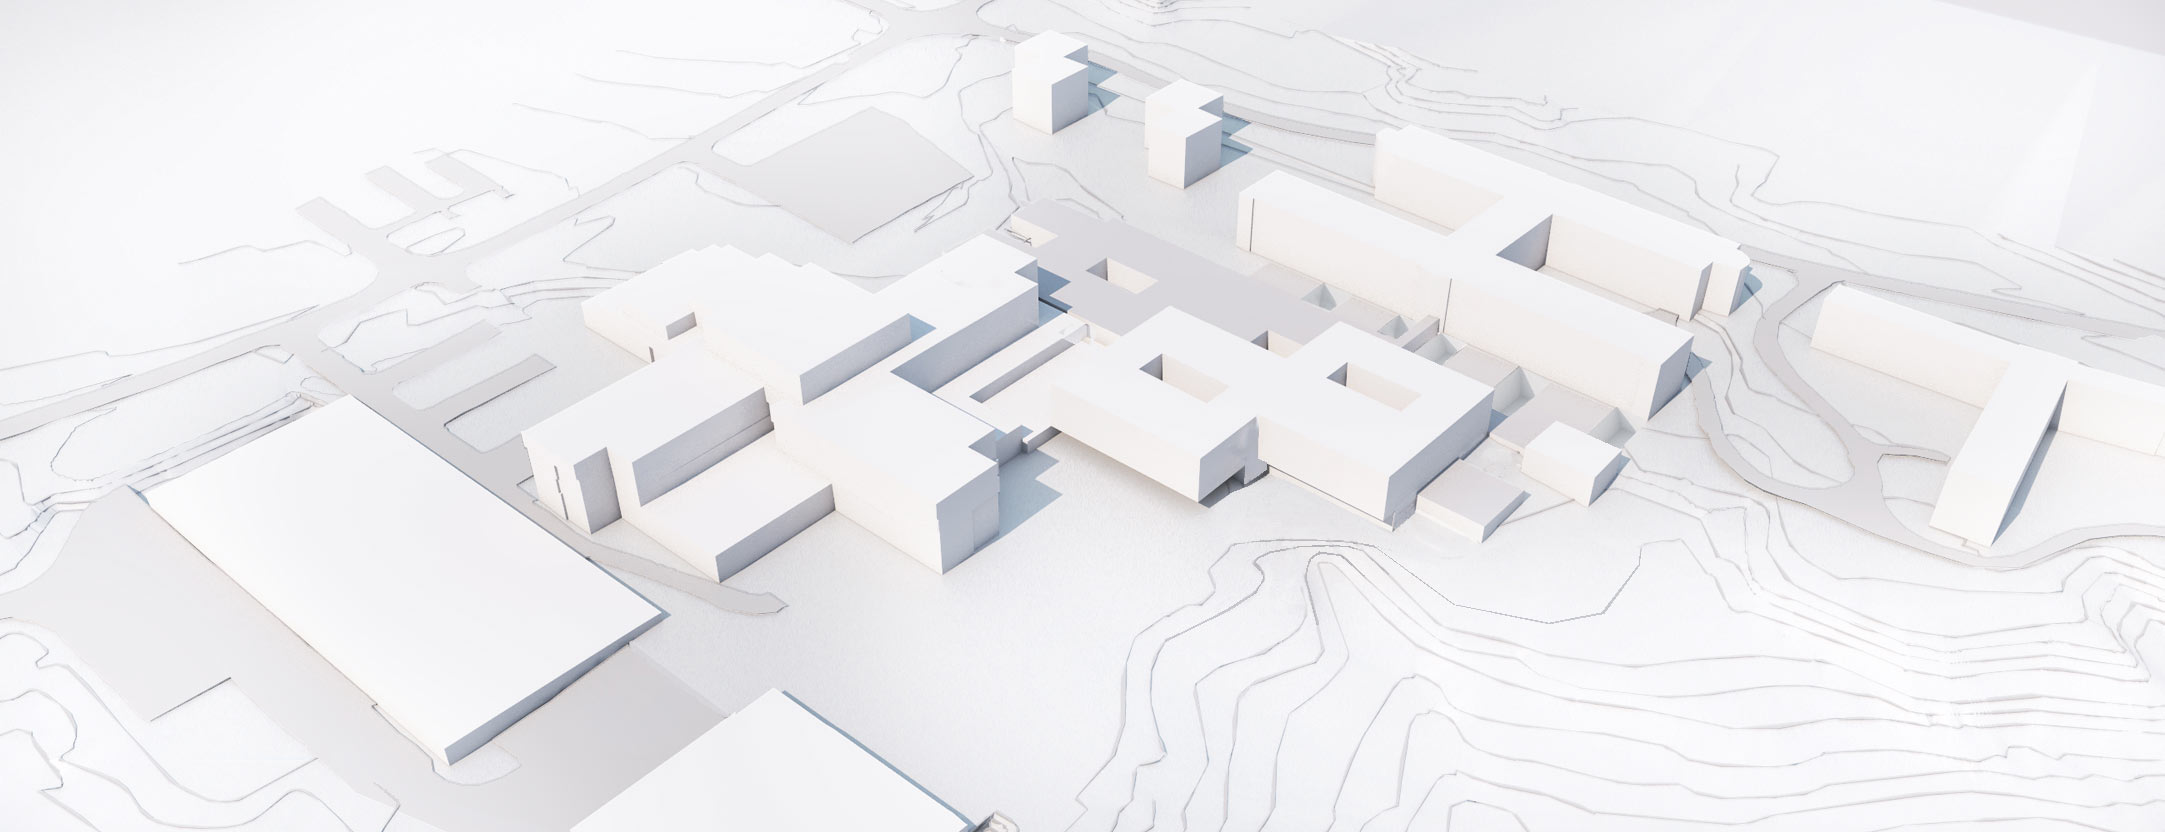 Rummelsberg Umgebungsmodell